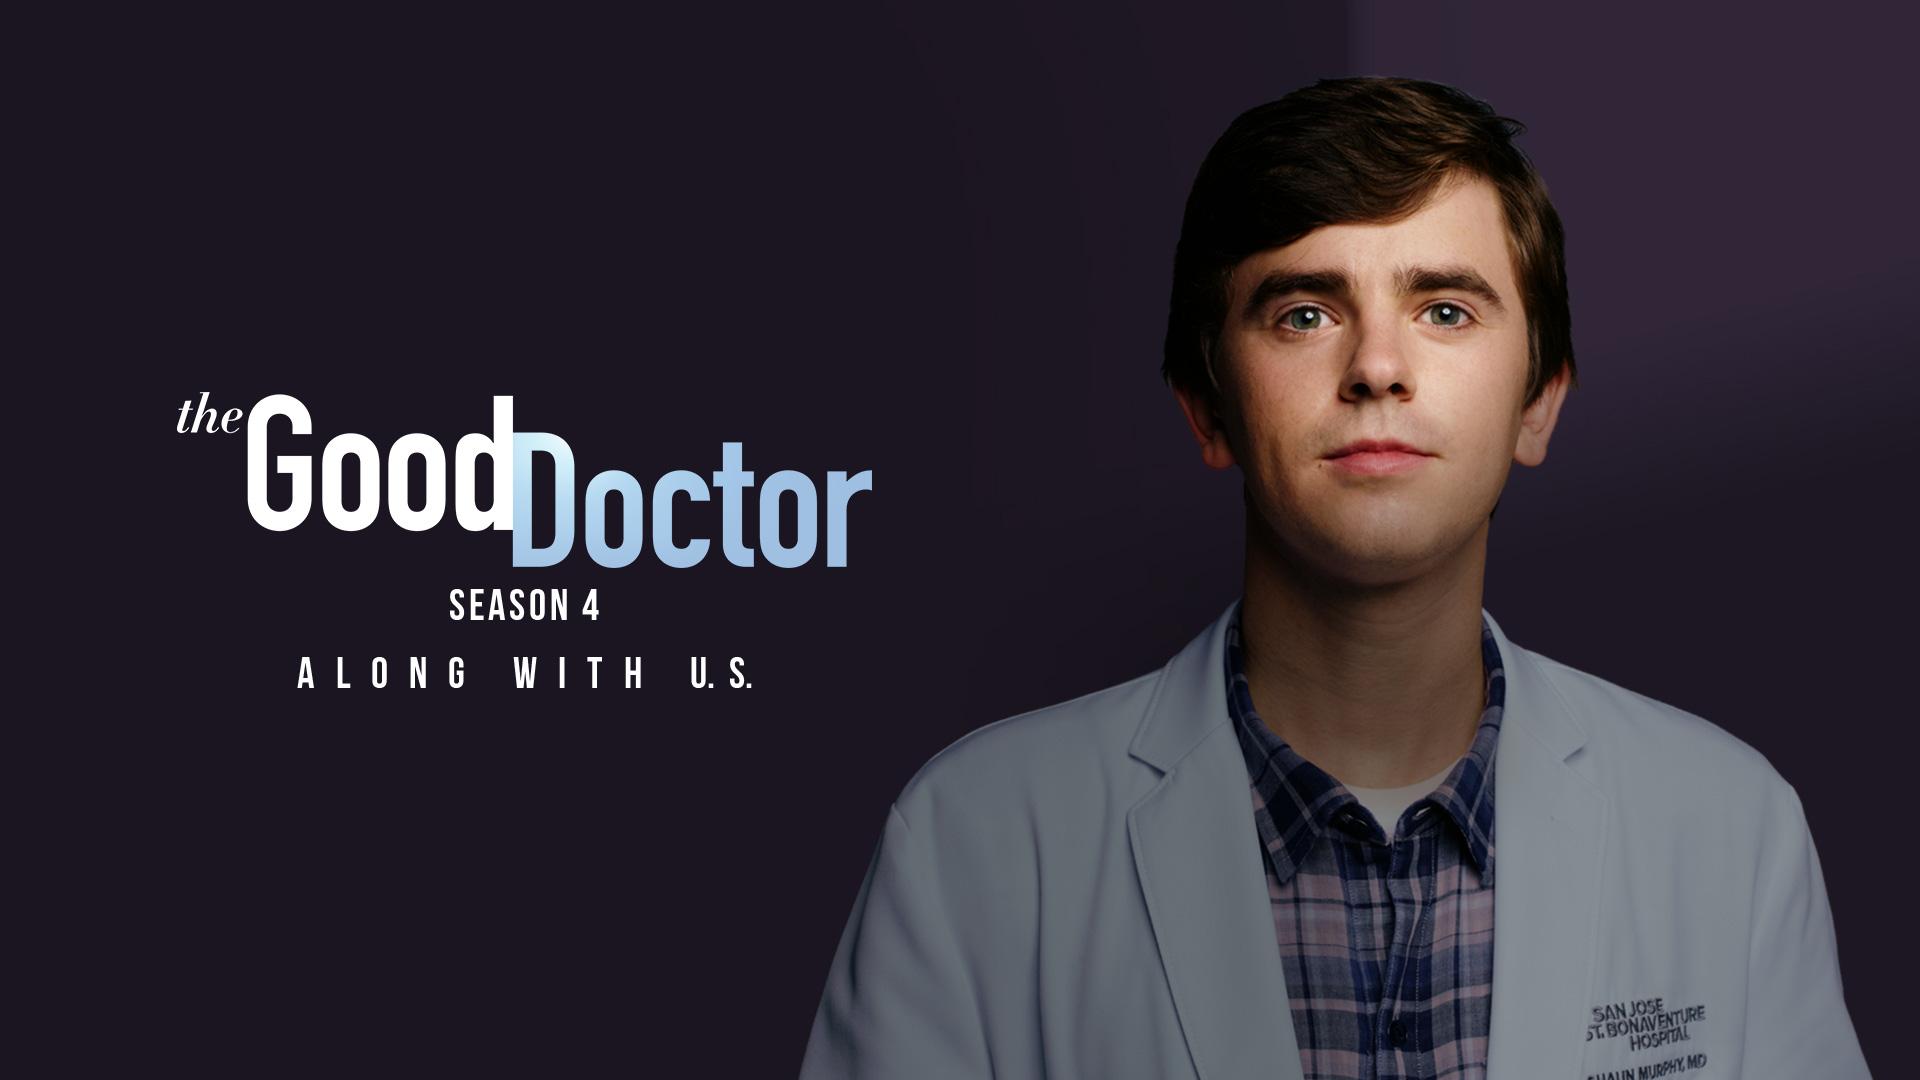 The Good Doctor Season 4 Episode 10 Release Date & Episode Schedule